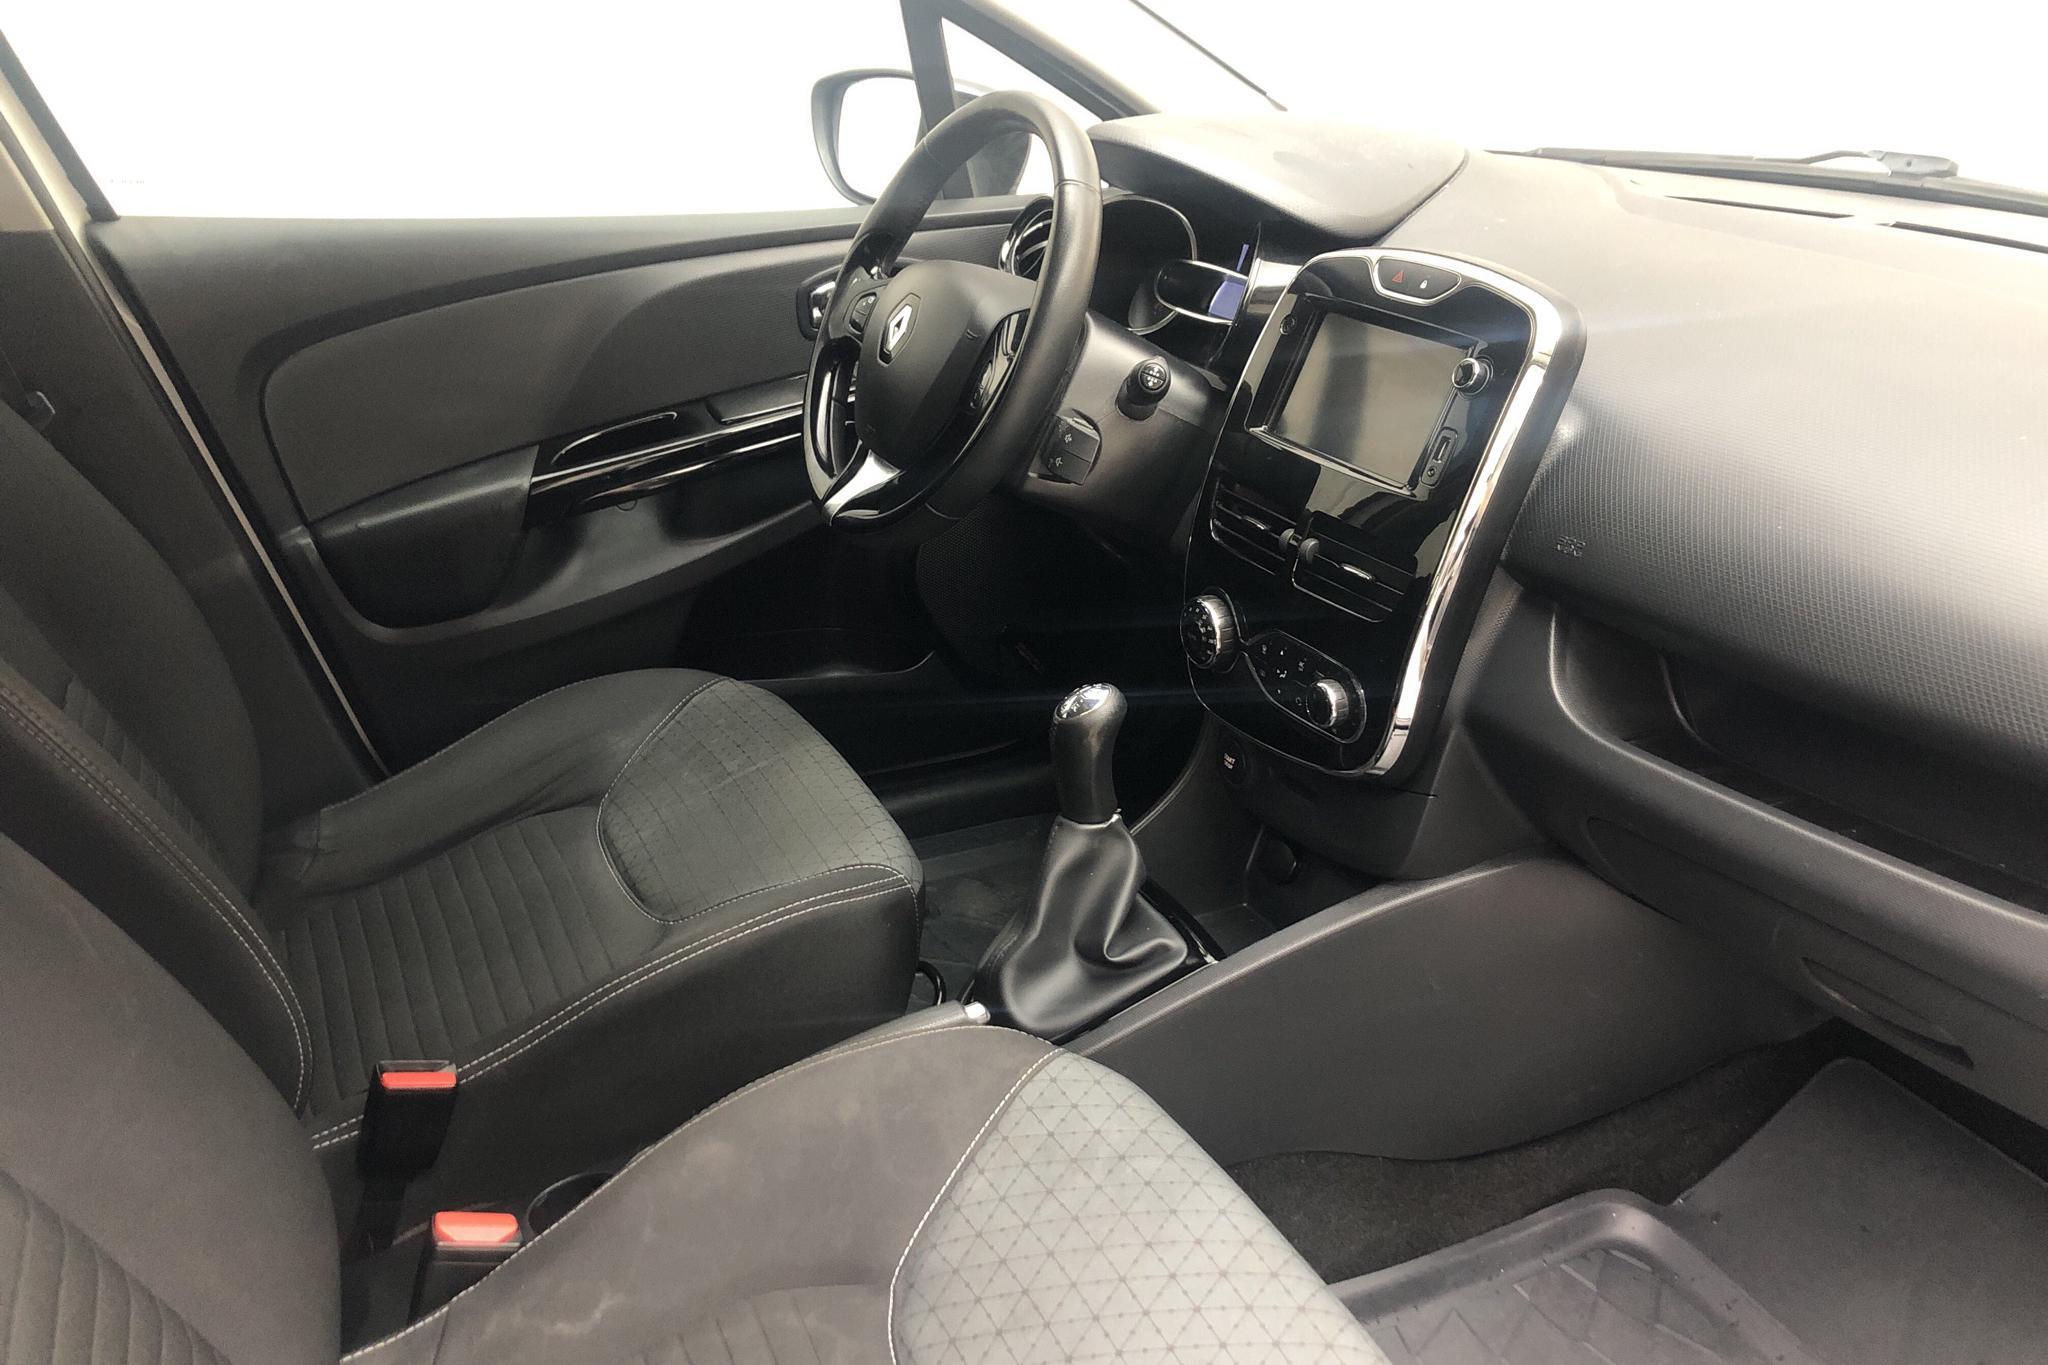 Renault Clio IV 0.9 TCe 90 5dr (90hk) - 16 121 mil - Manuell - vit - 2014